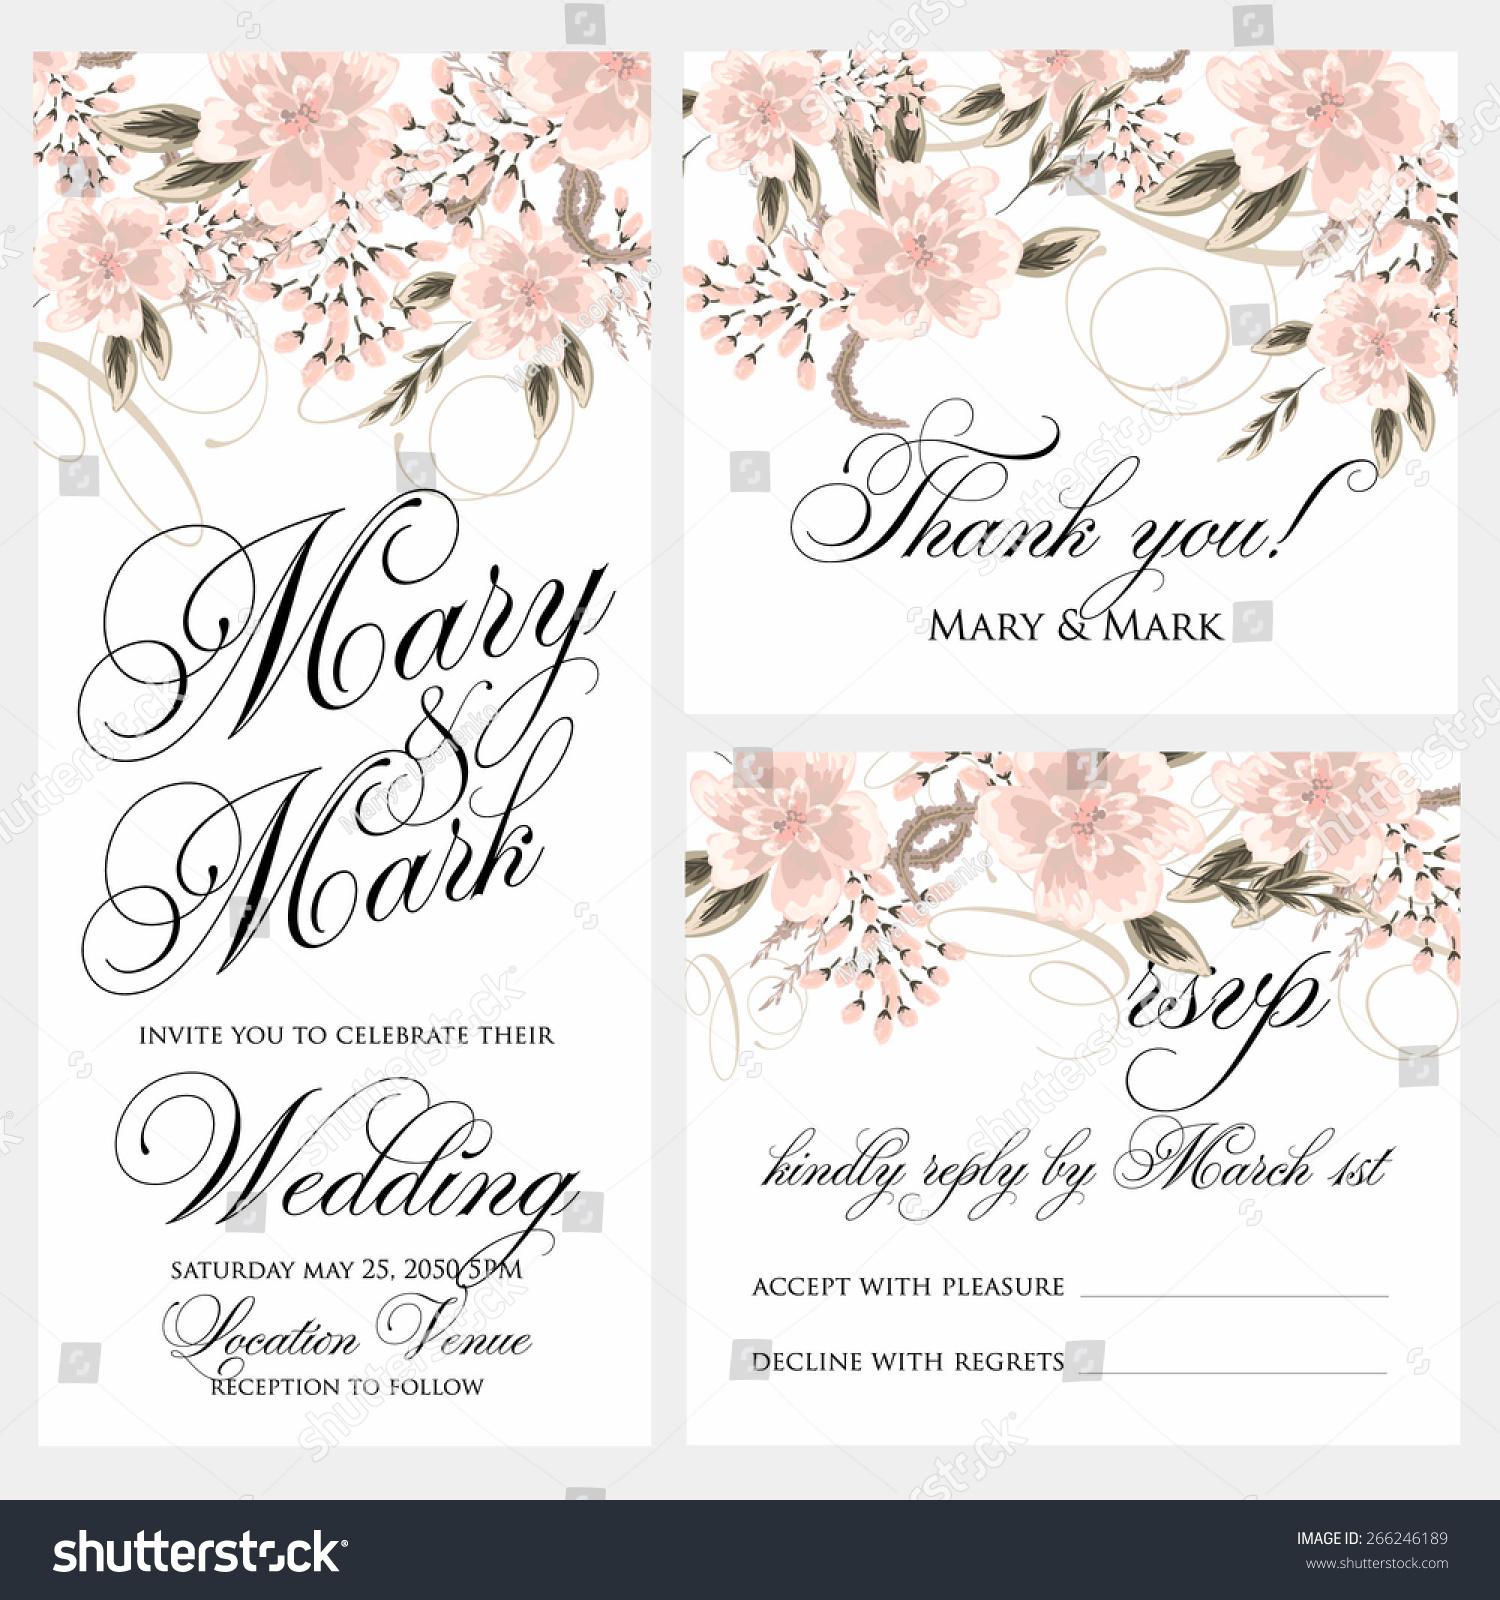 receiving wedding invitation after rsvp date - 28 images - wedding ...